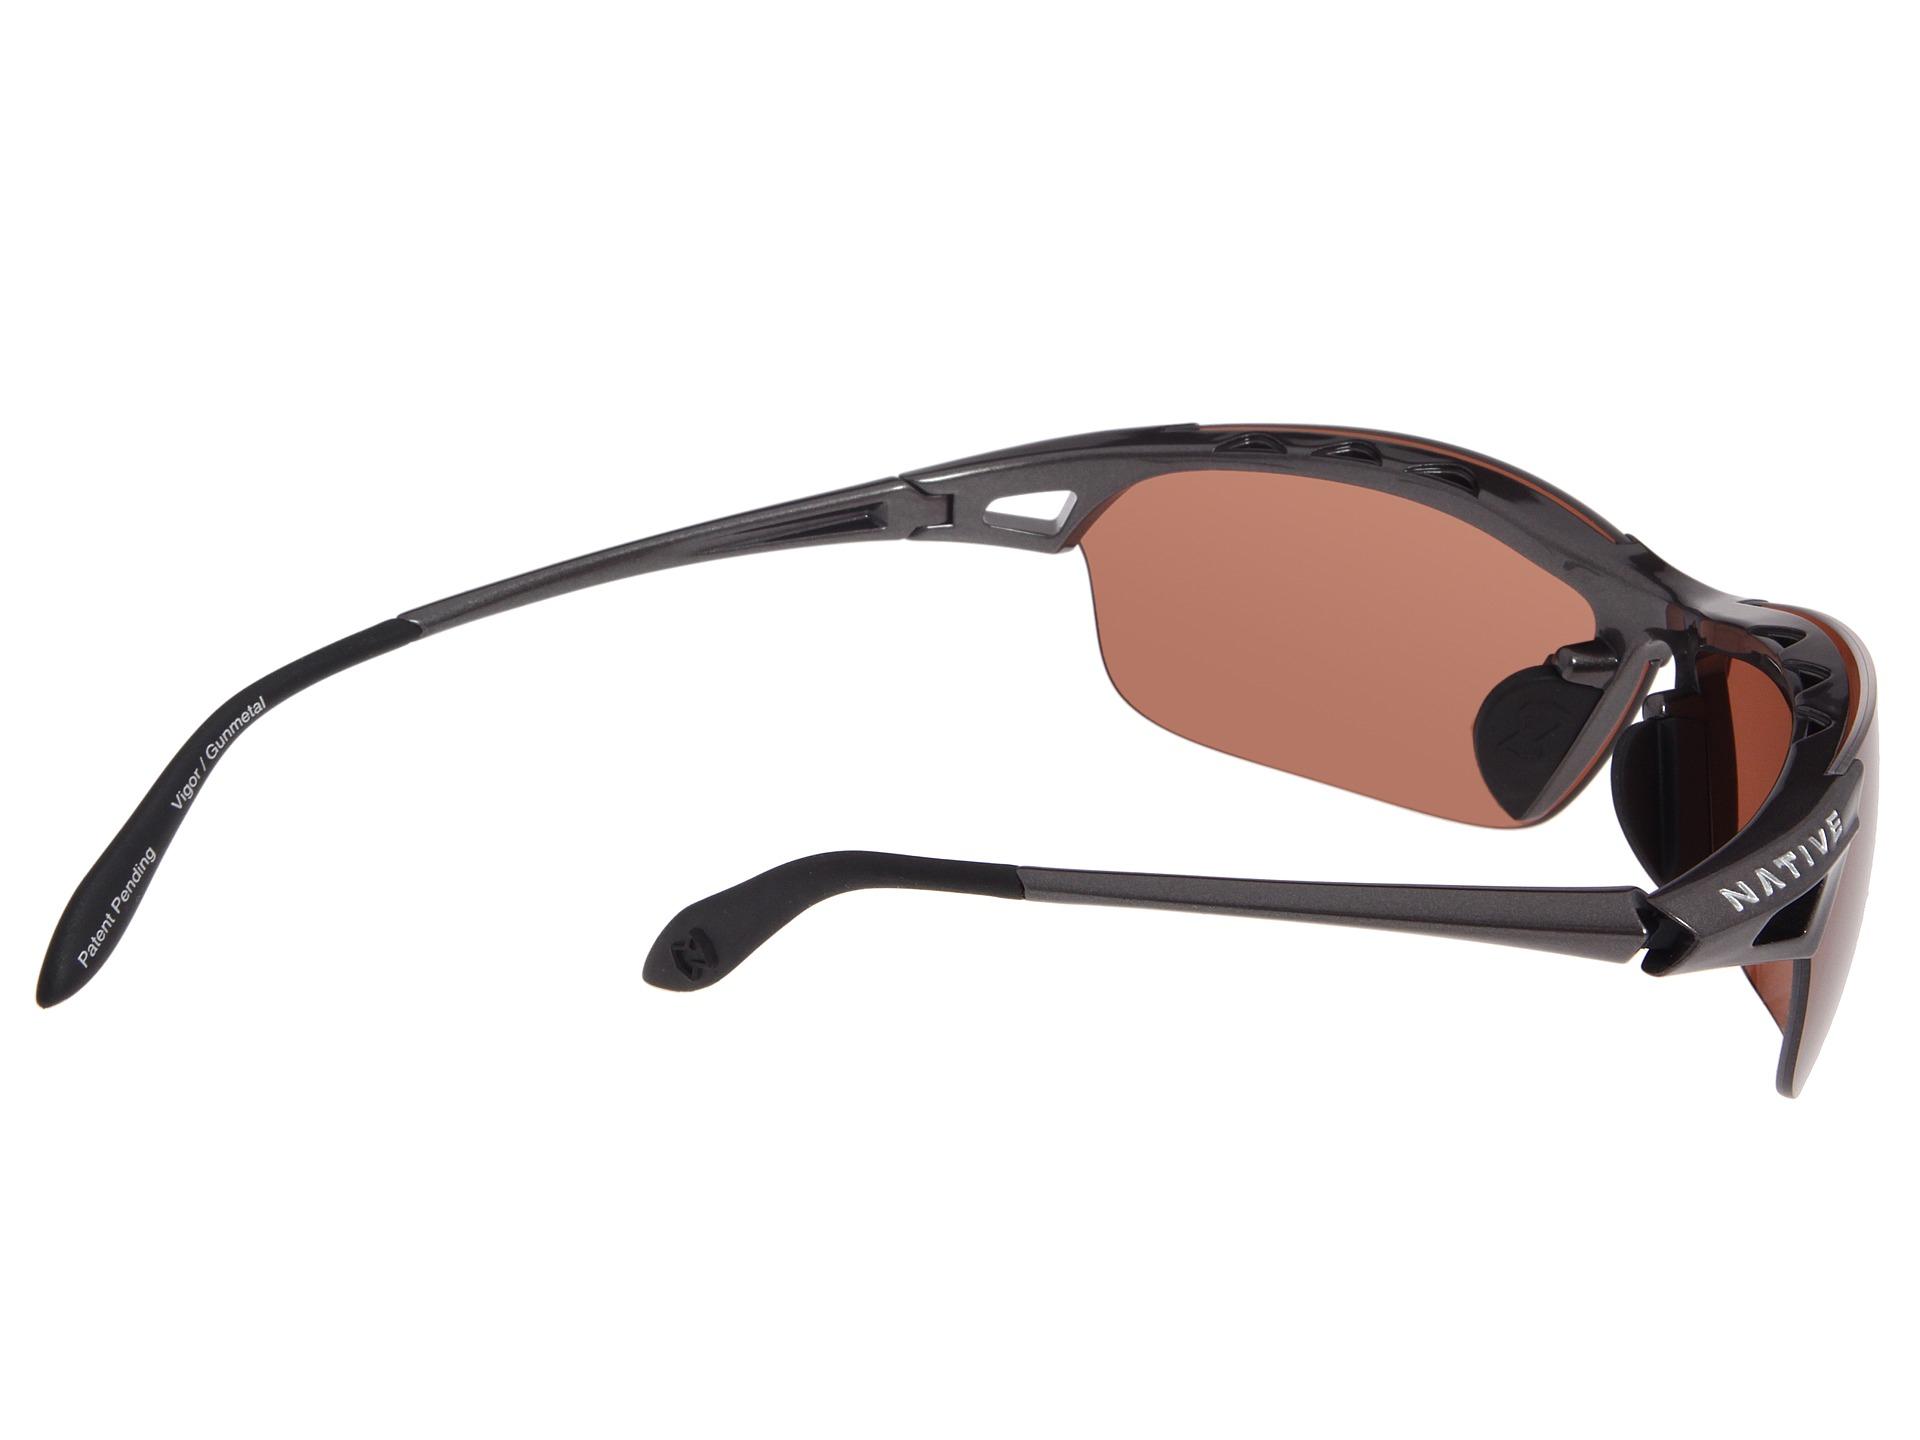 81ba592a922 Lyst - Native Eyewear Vigor Polarized in Gray